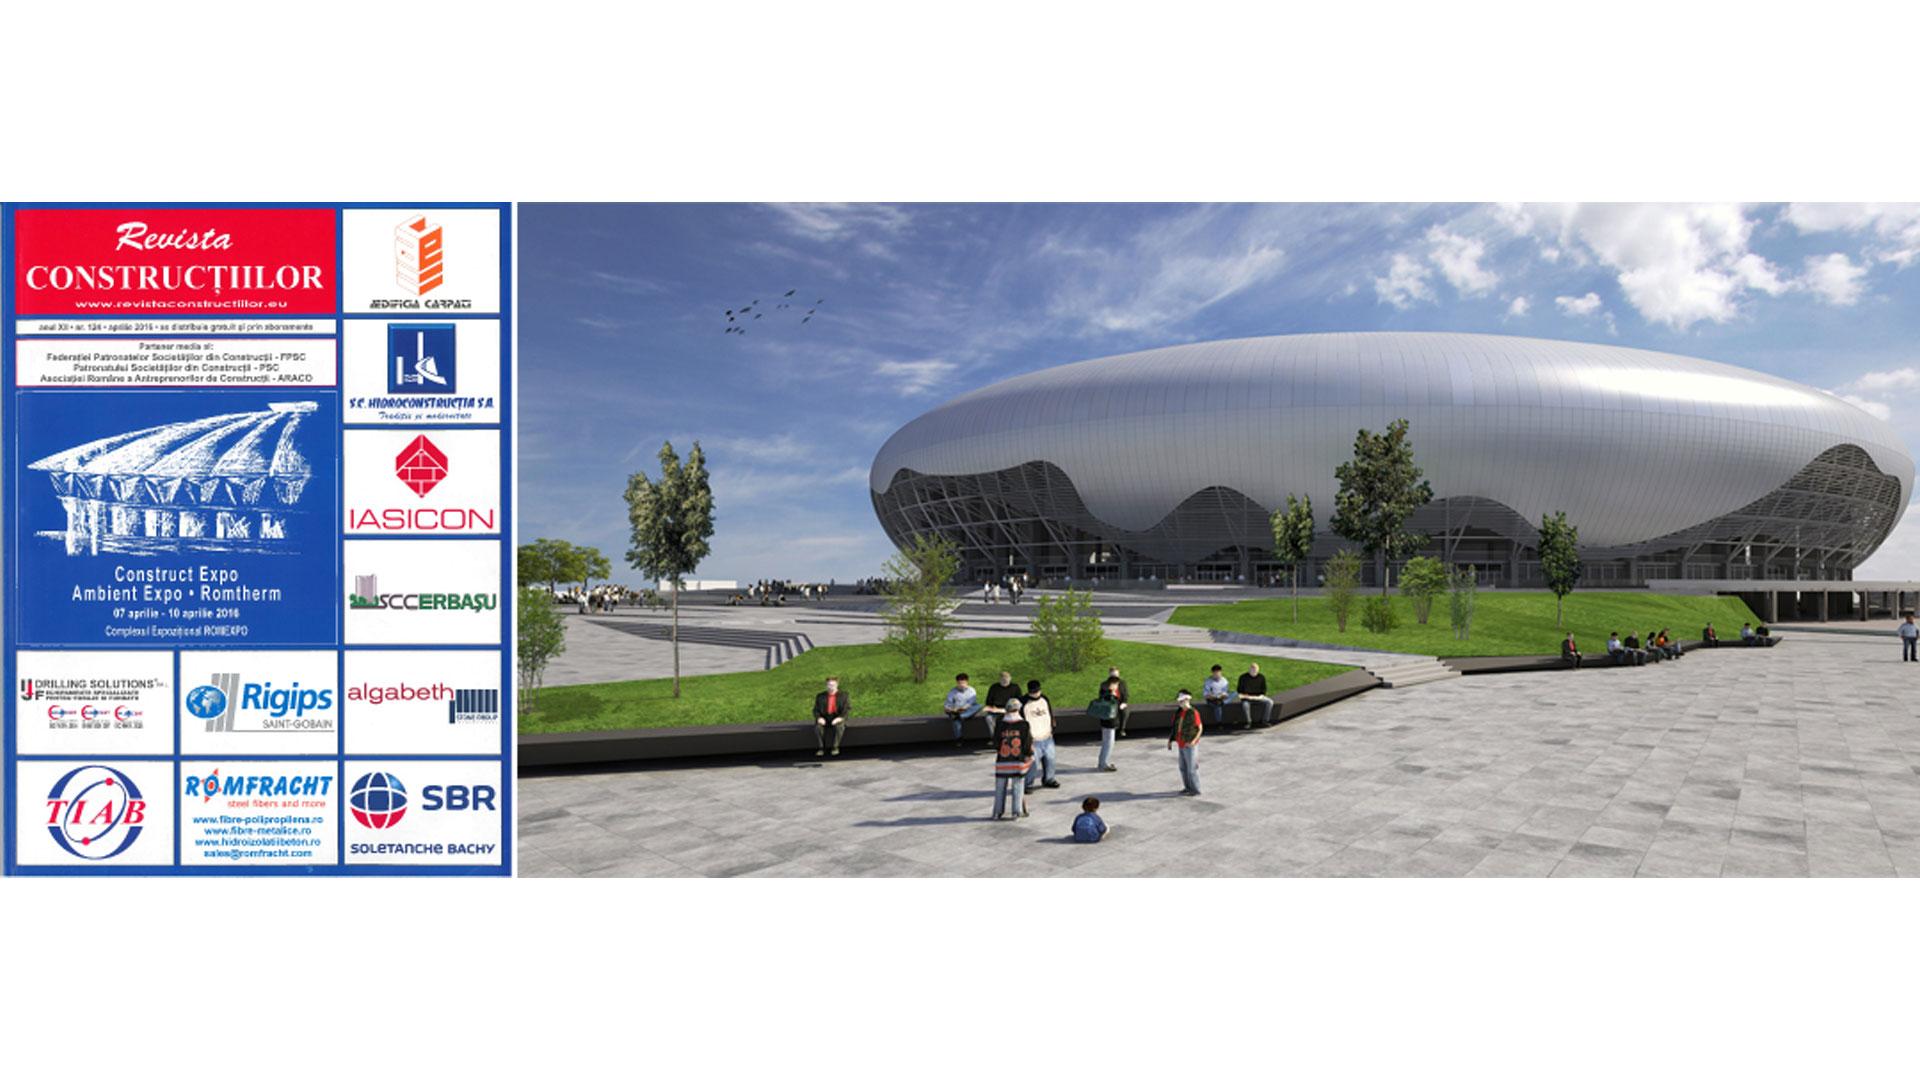 Revista Construcțiilor, Ion Oblemenco Stadium, 2016